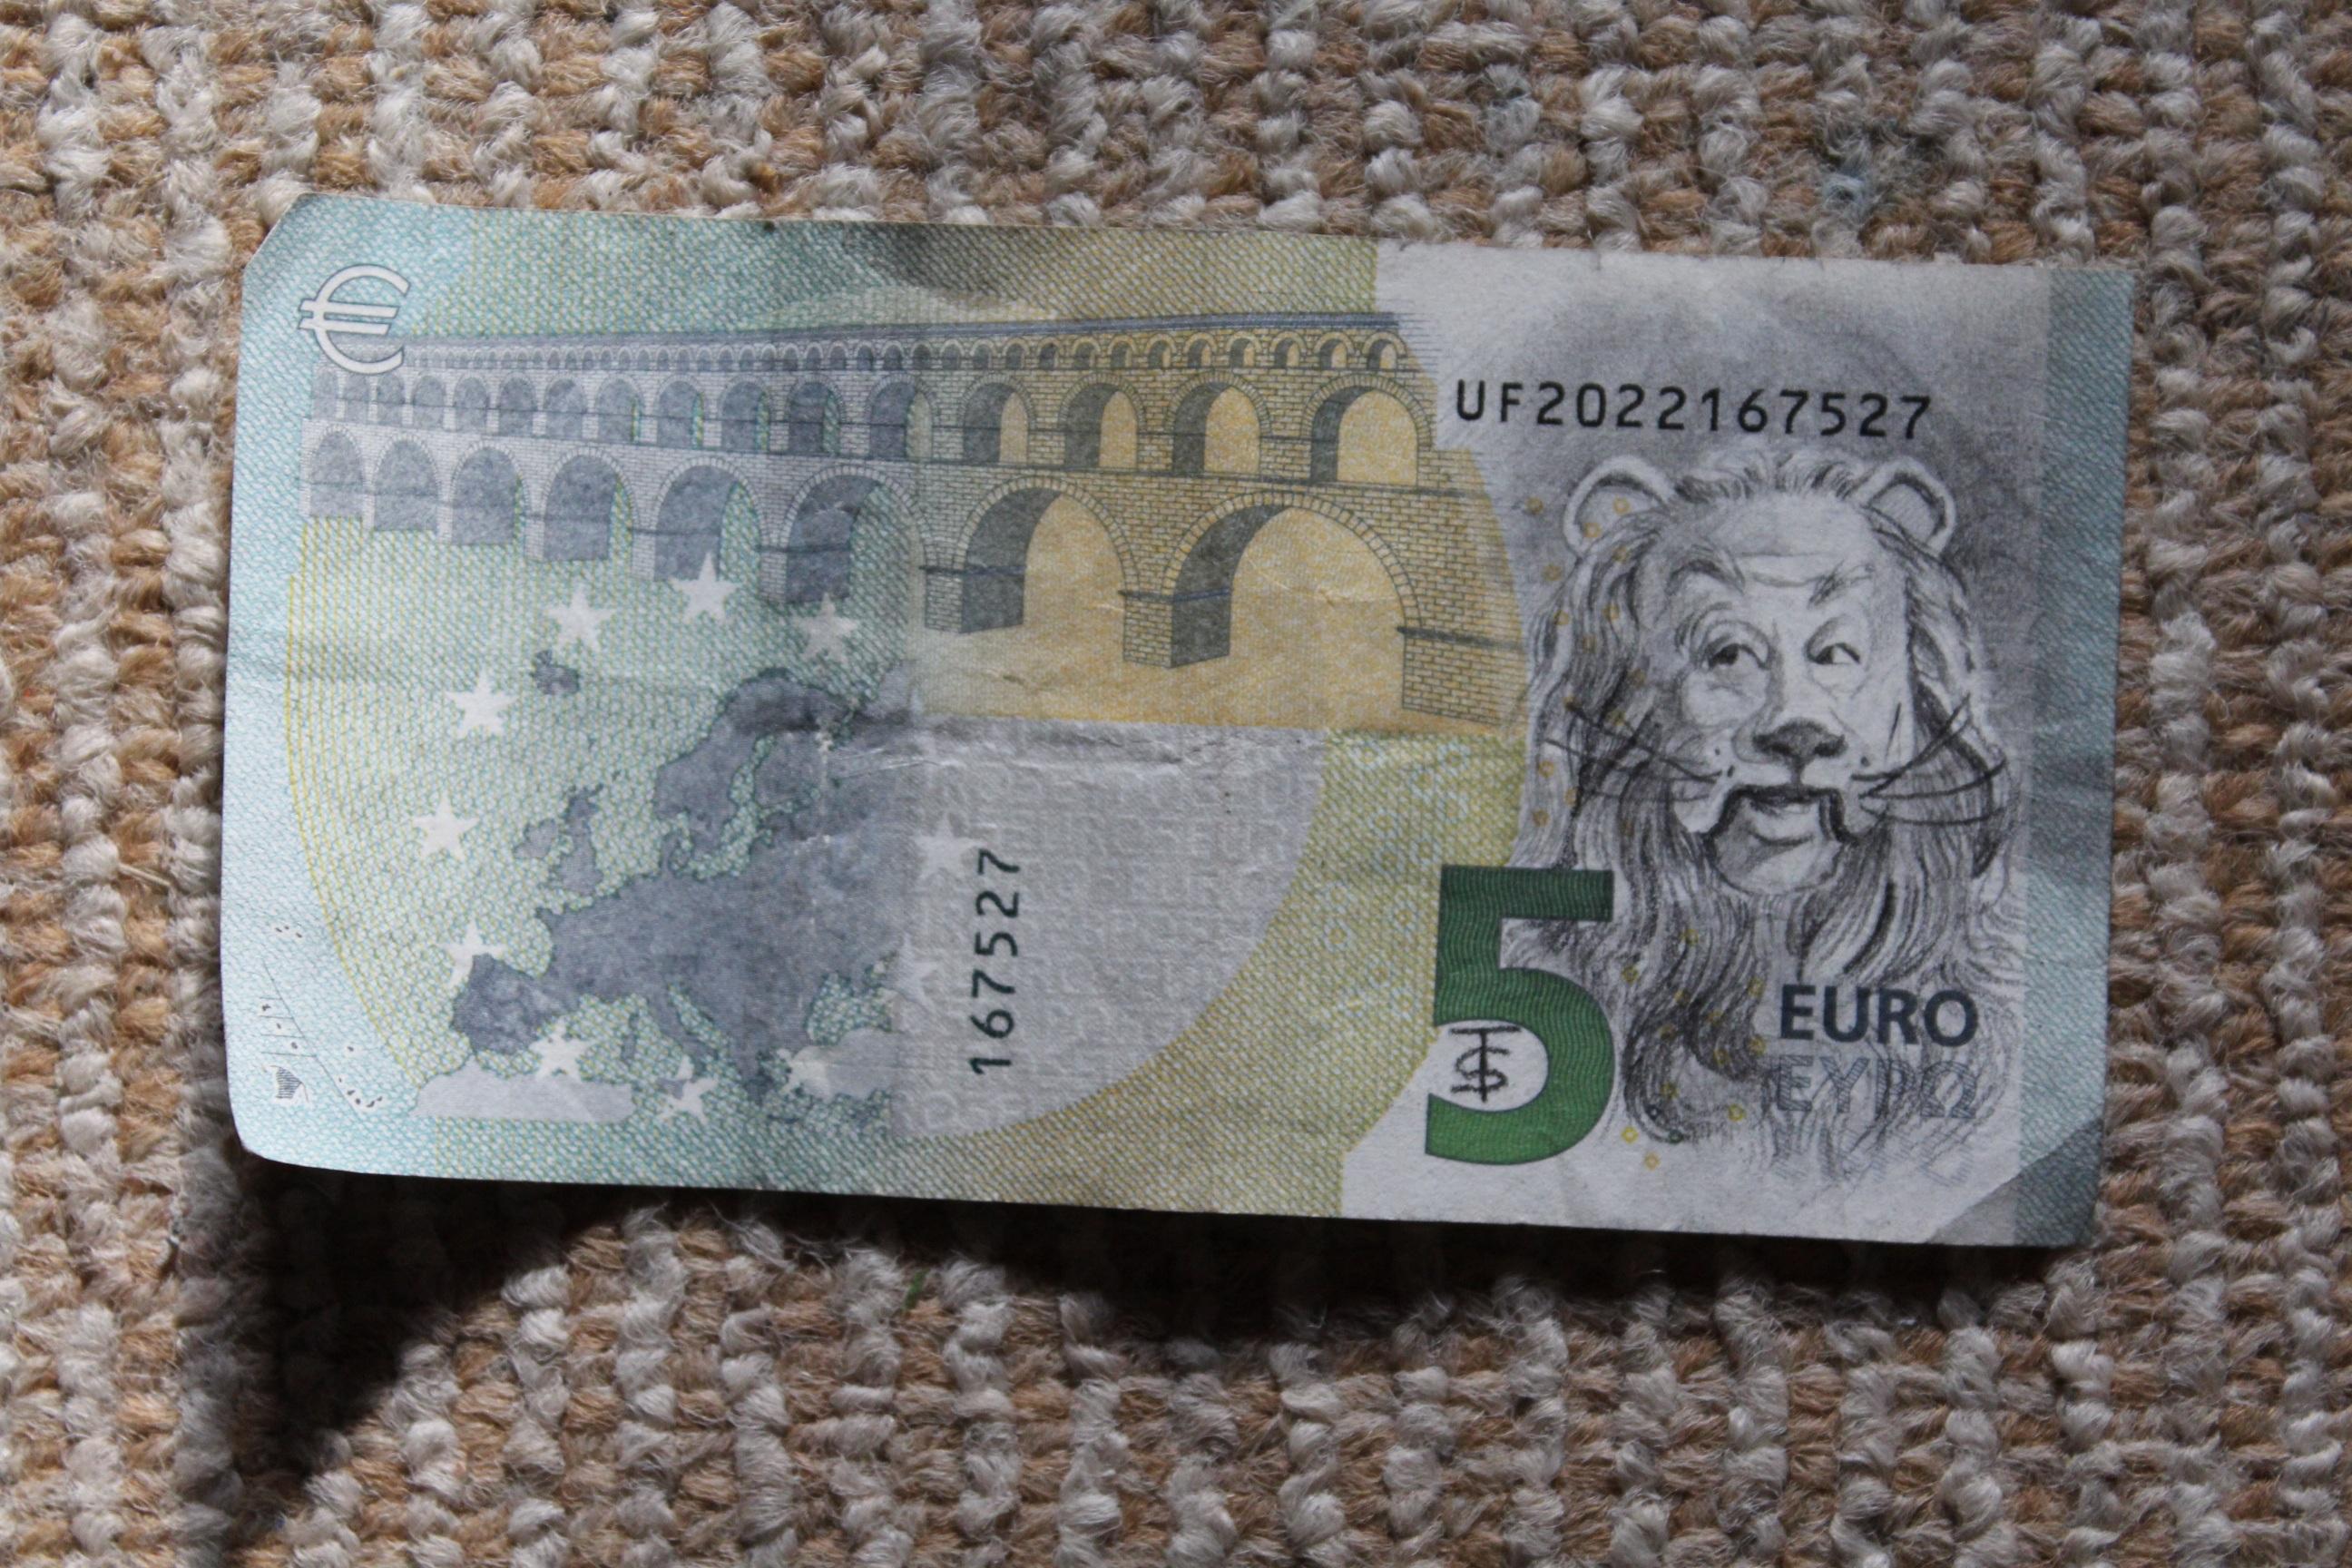 Camera Film Hollywood Money Paper Material Cash Currency Cinema Banknote Dollar Bill Film Roll Film